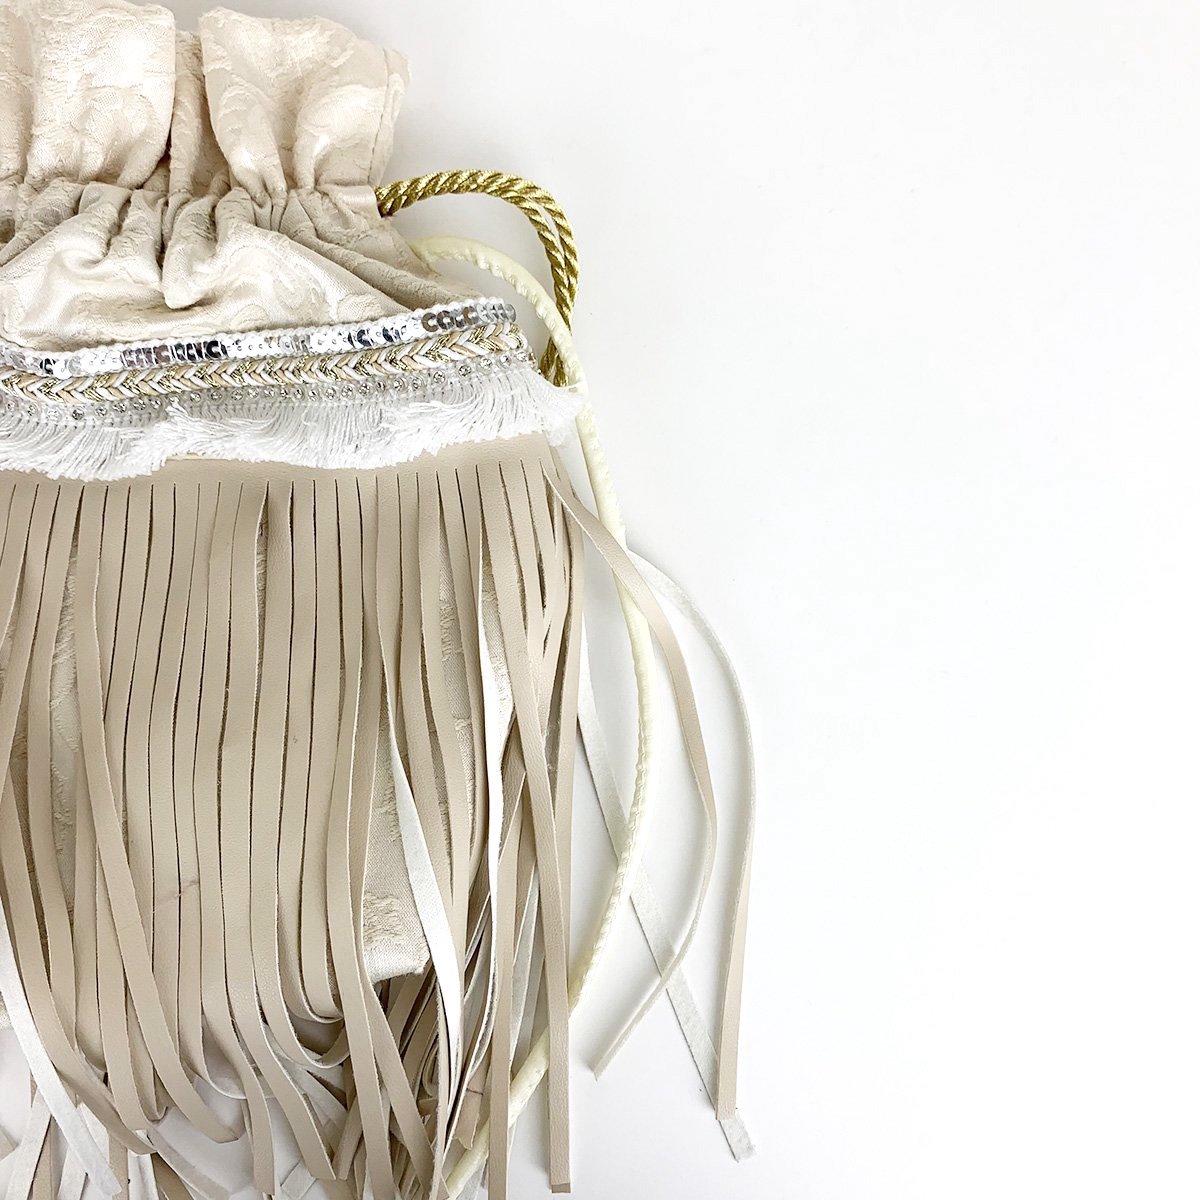 Fair Lady Bag 詳細画像11